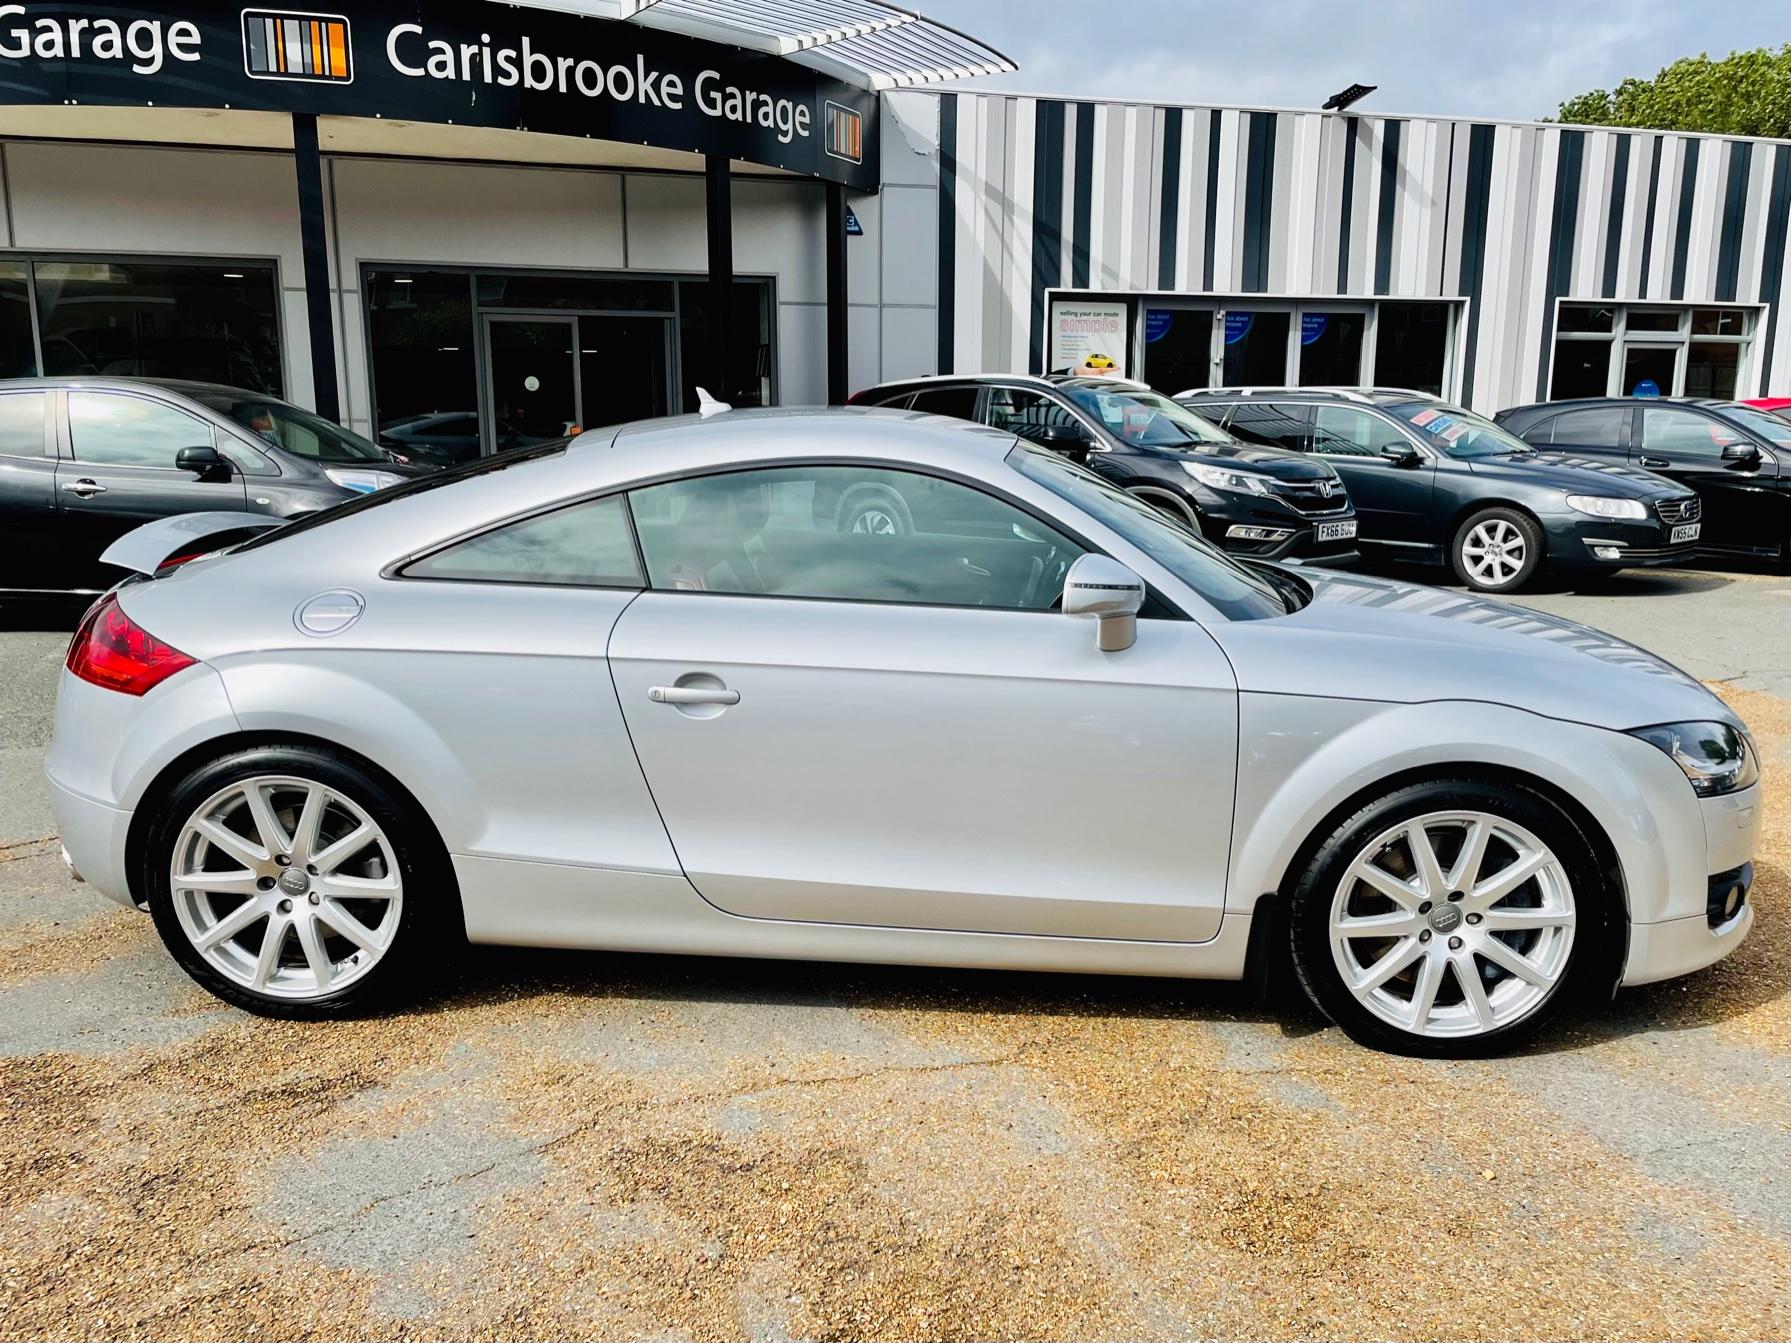 Car For Sale Audi TT - WF56FWB Sixers Group Image #2